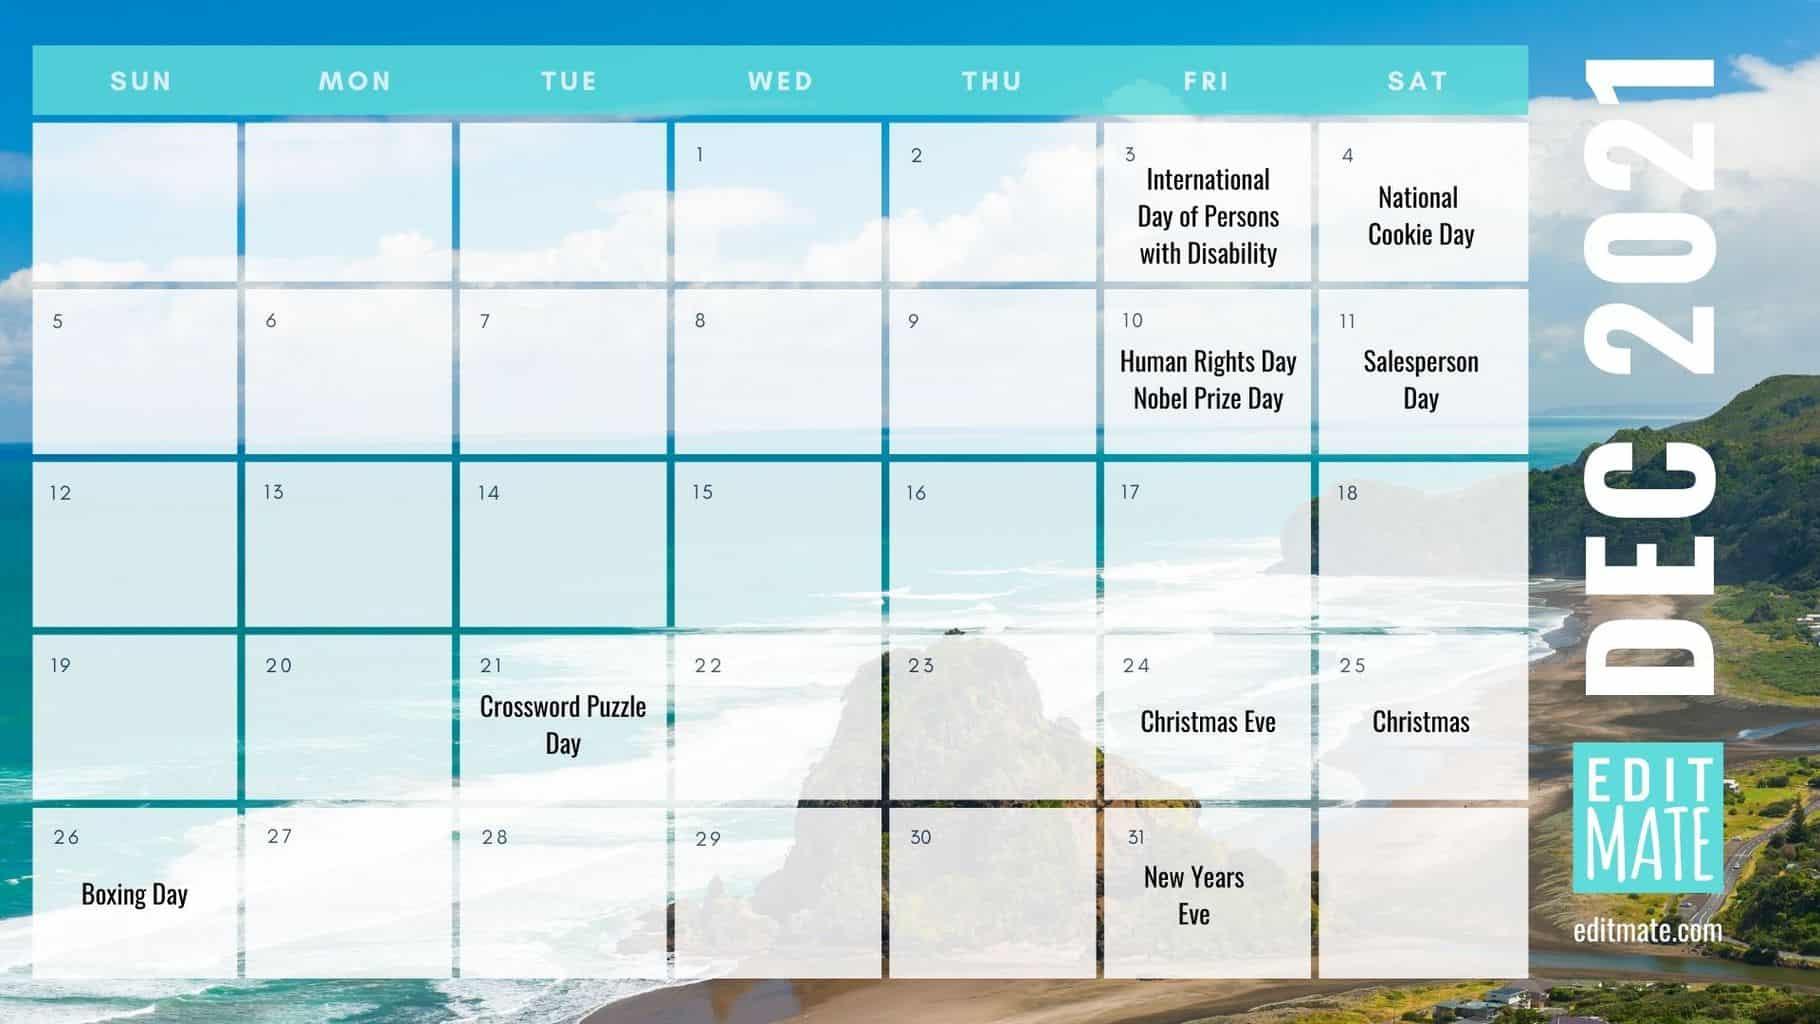 2021 Social Media Holiday Calendar   Editmate regarding December Calendar 2021 Empire And Puzzles